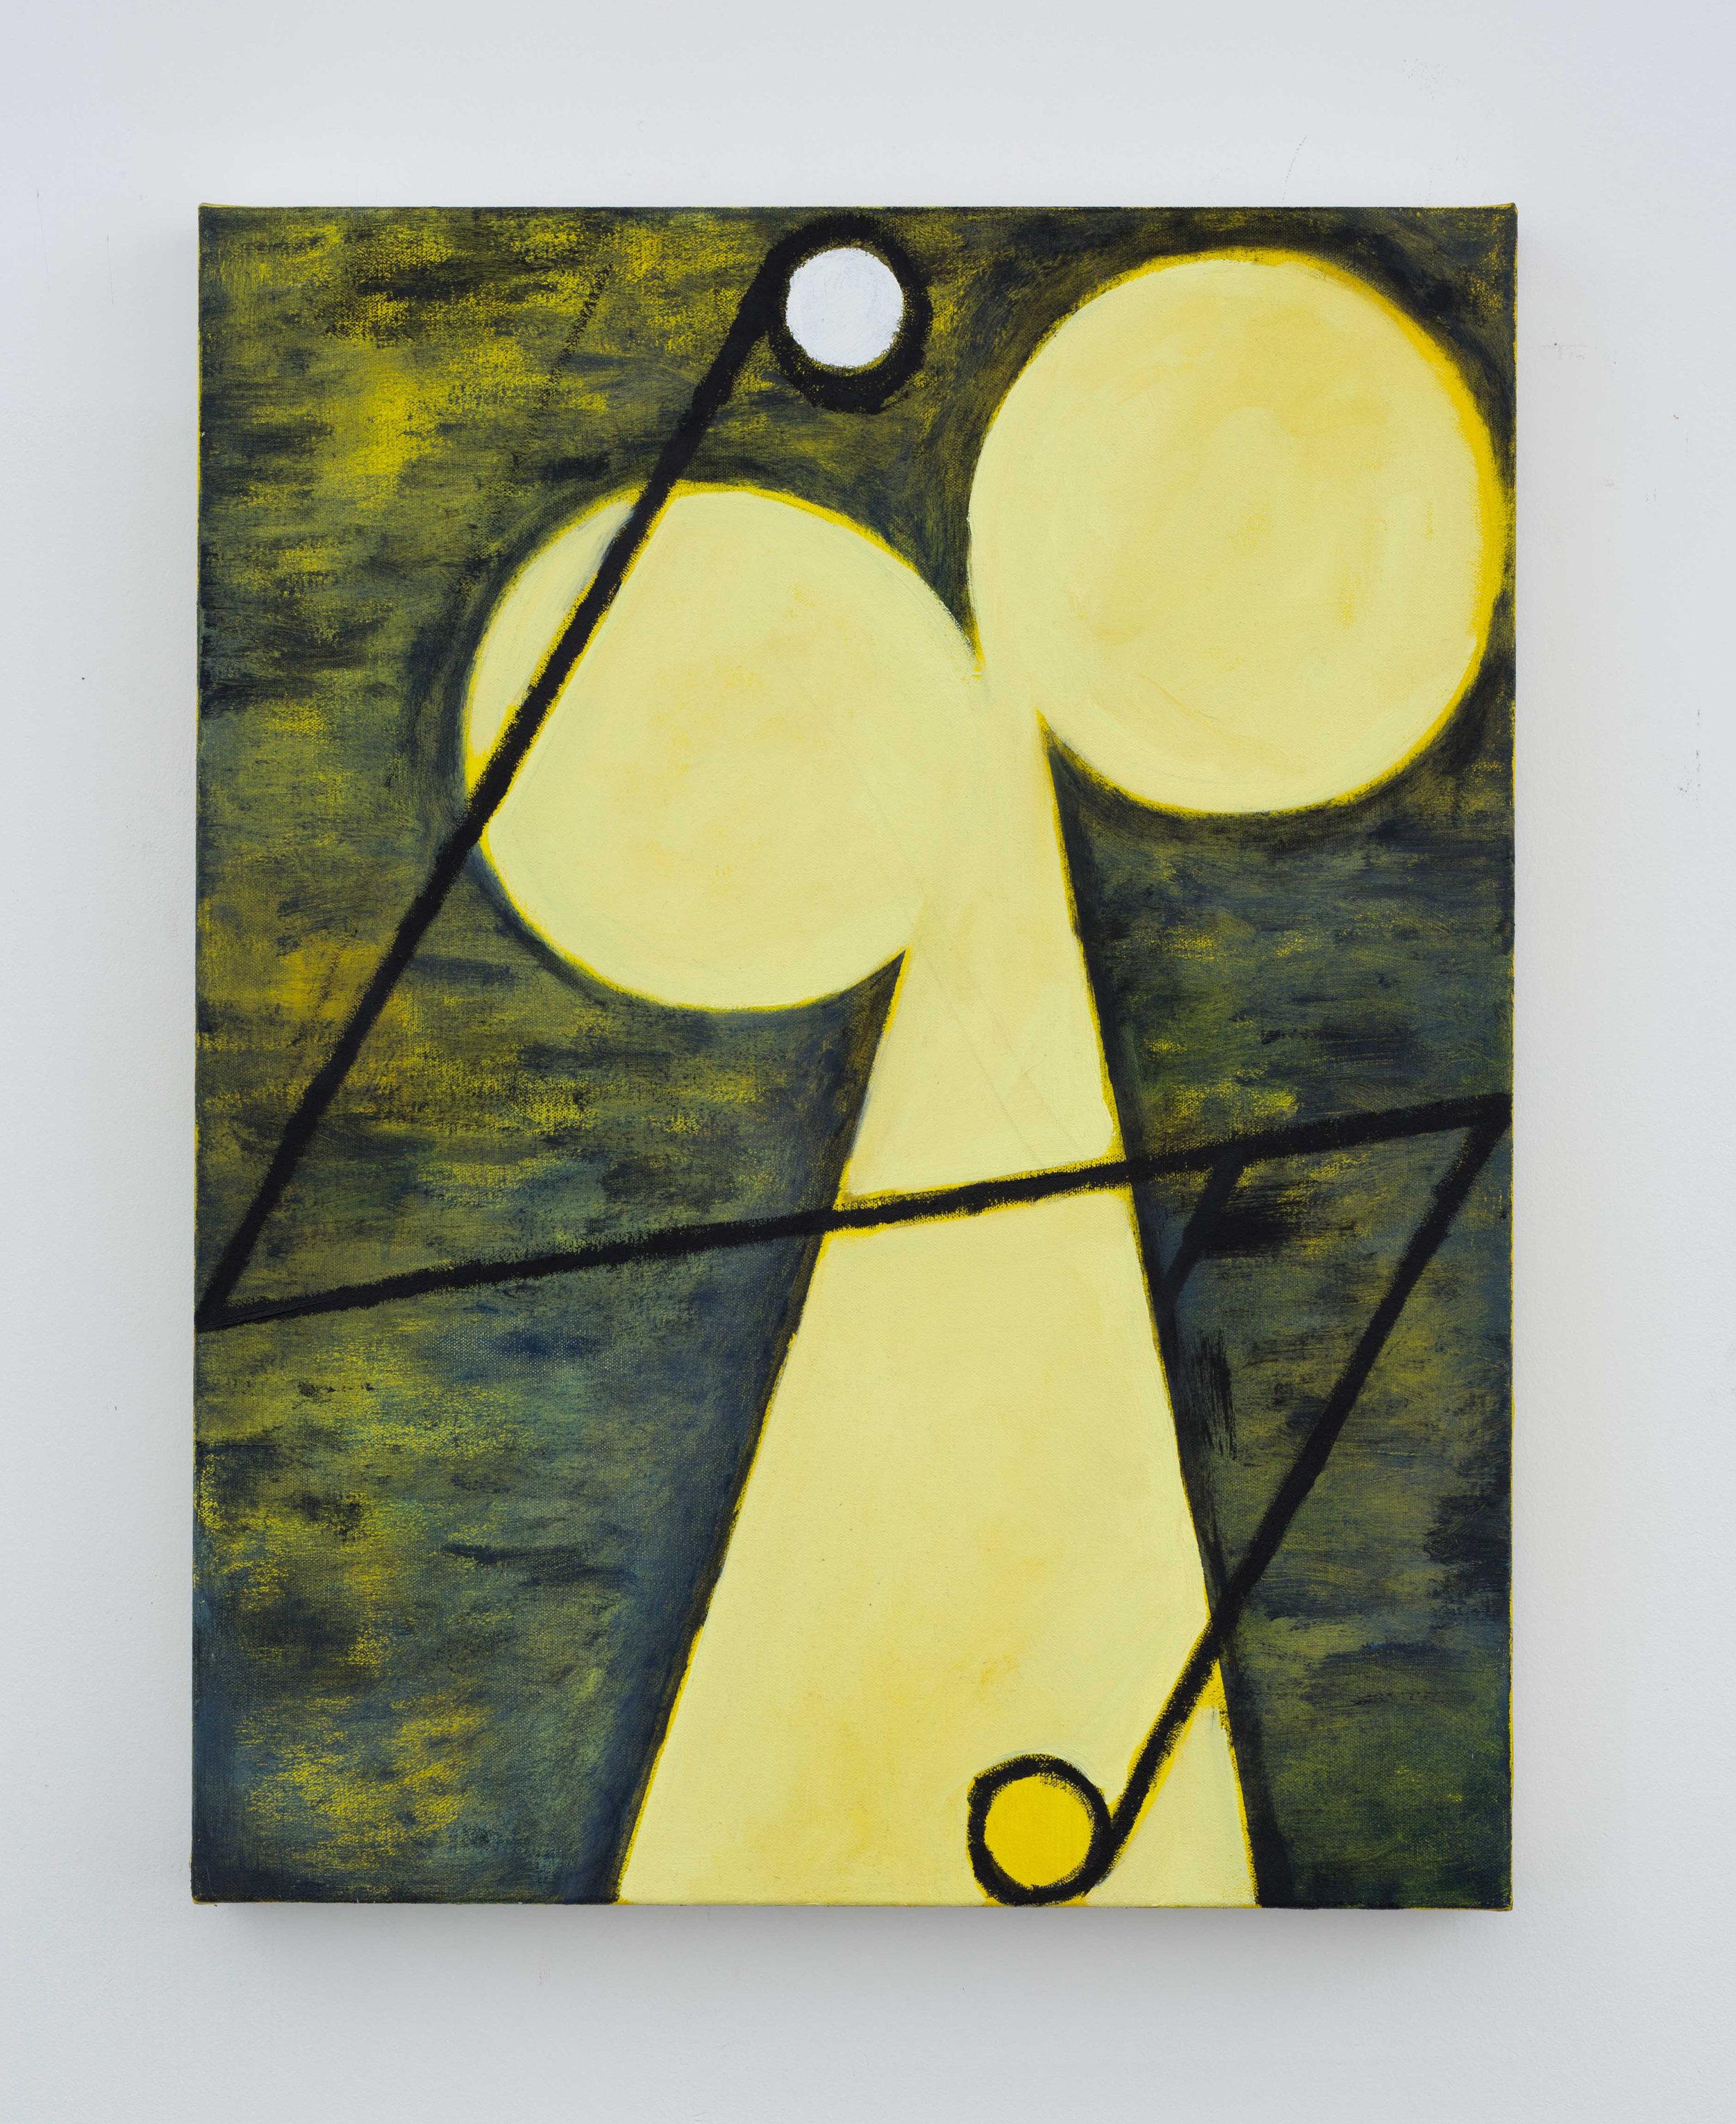 Cold Spot  2017 Oil on canvas 60x45cm